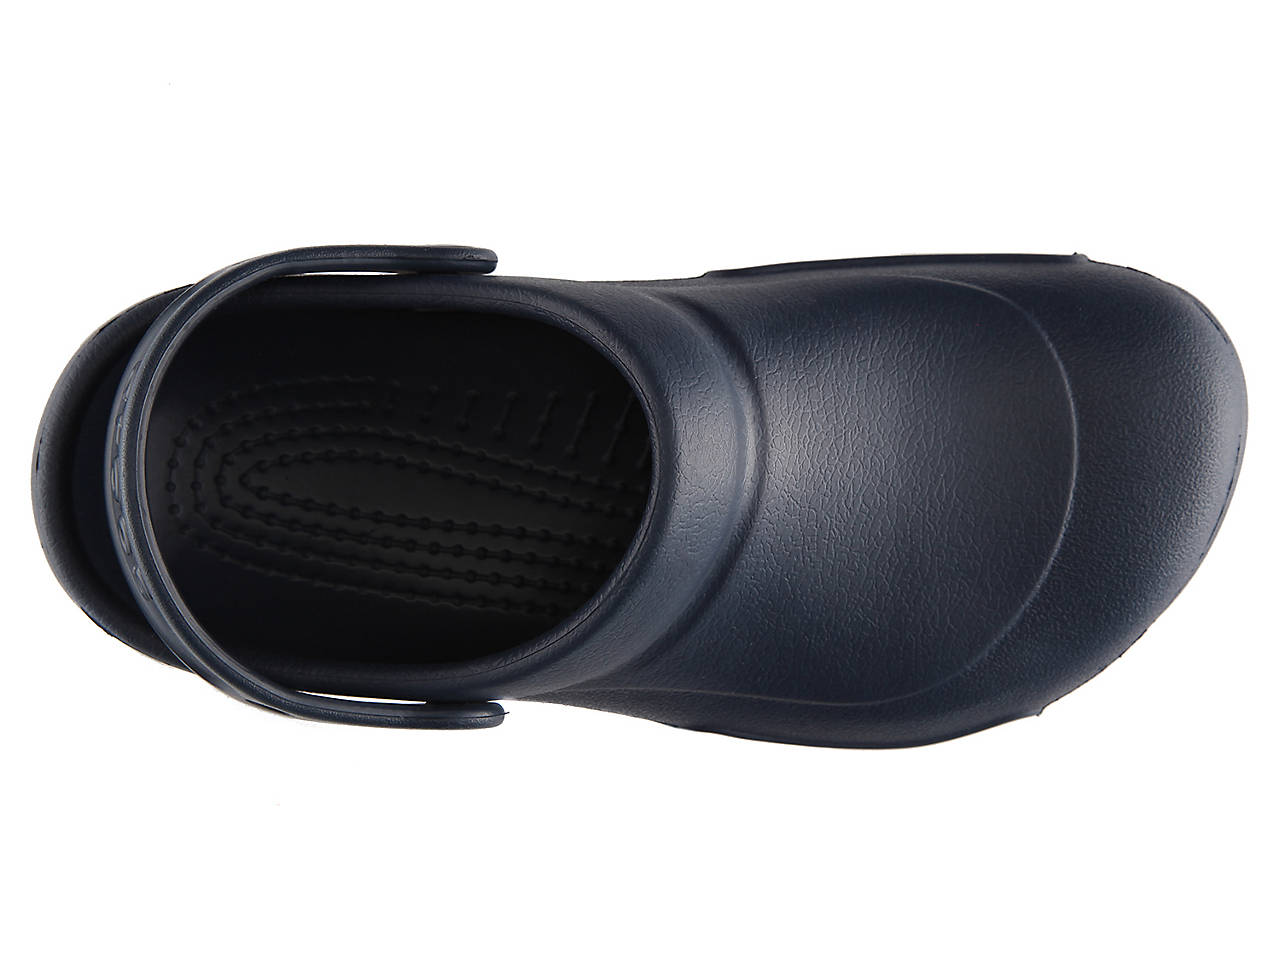 4694a8719a37 Crocs Bistro Work Clog Women s Shoes